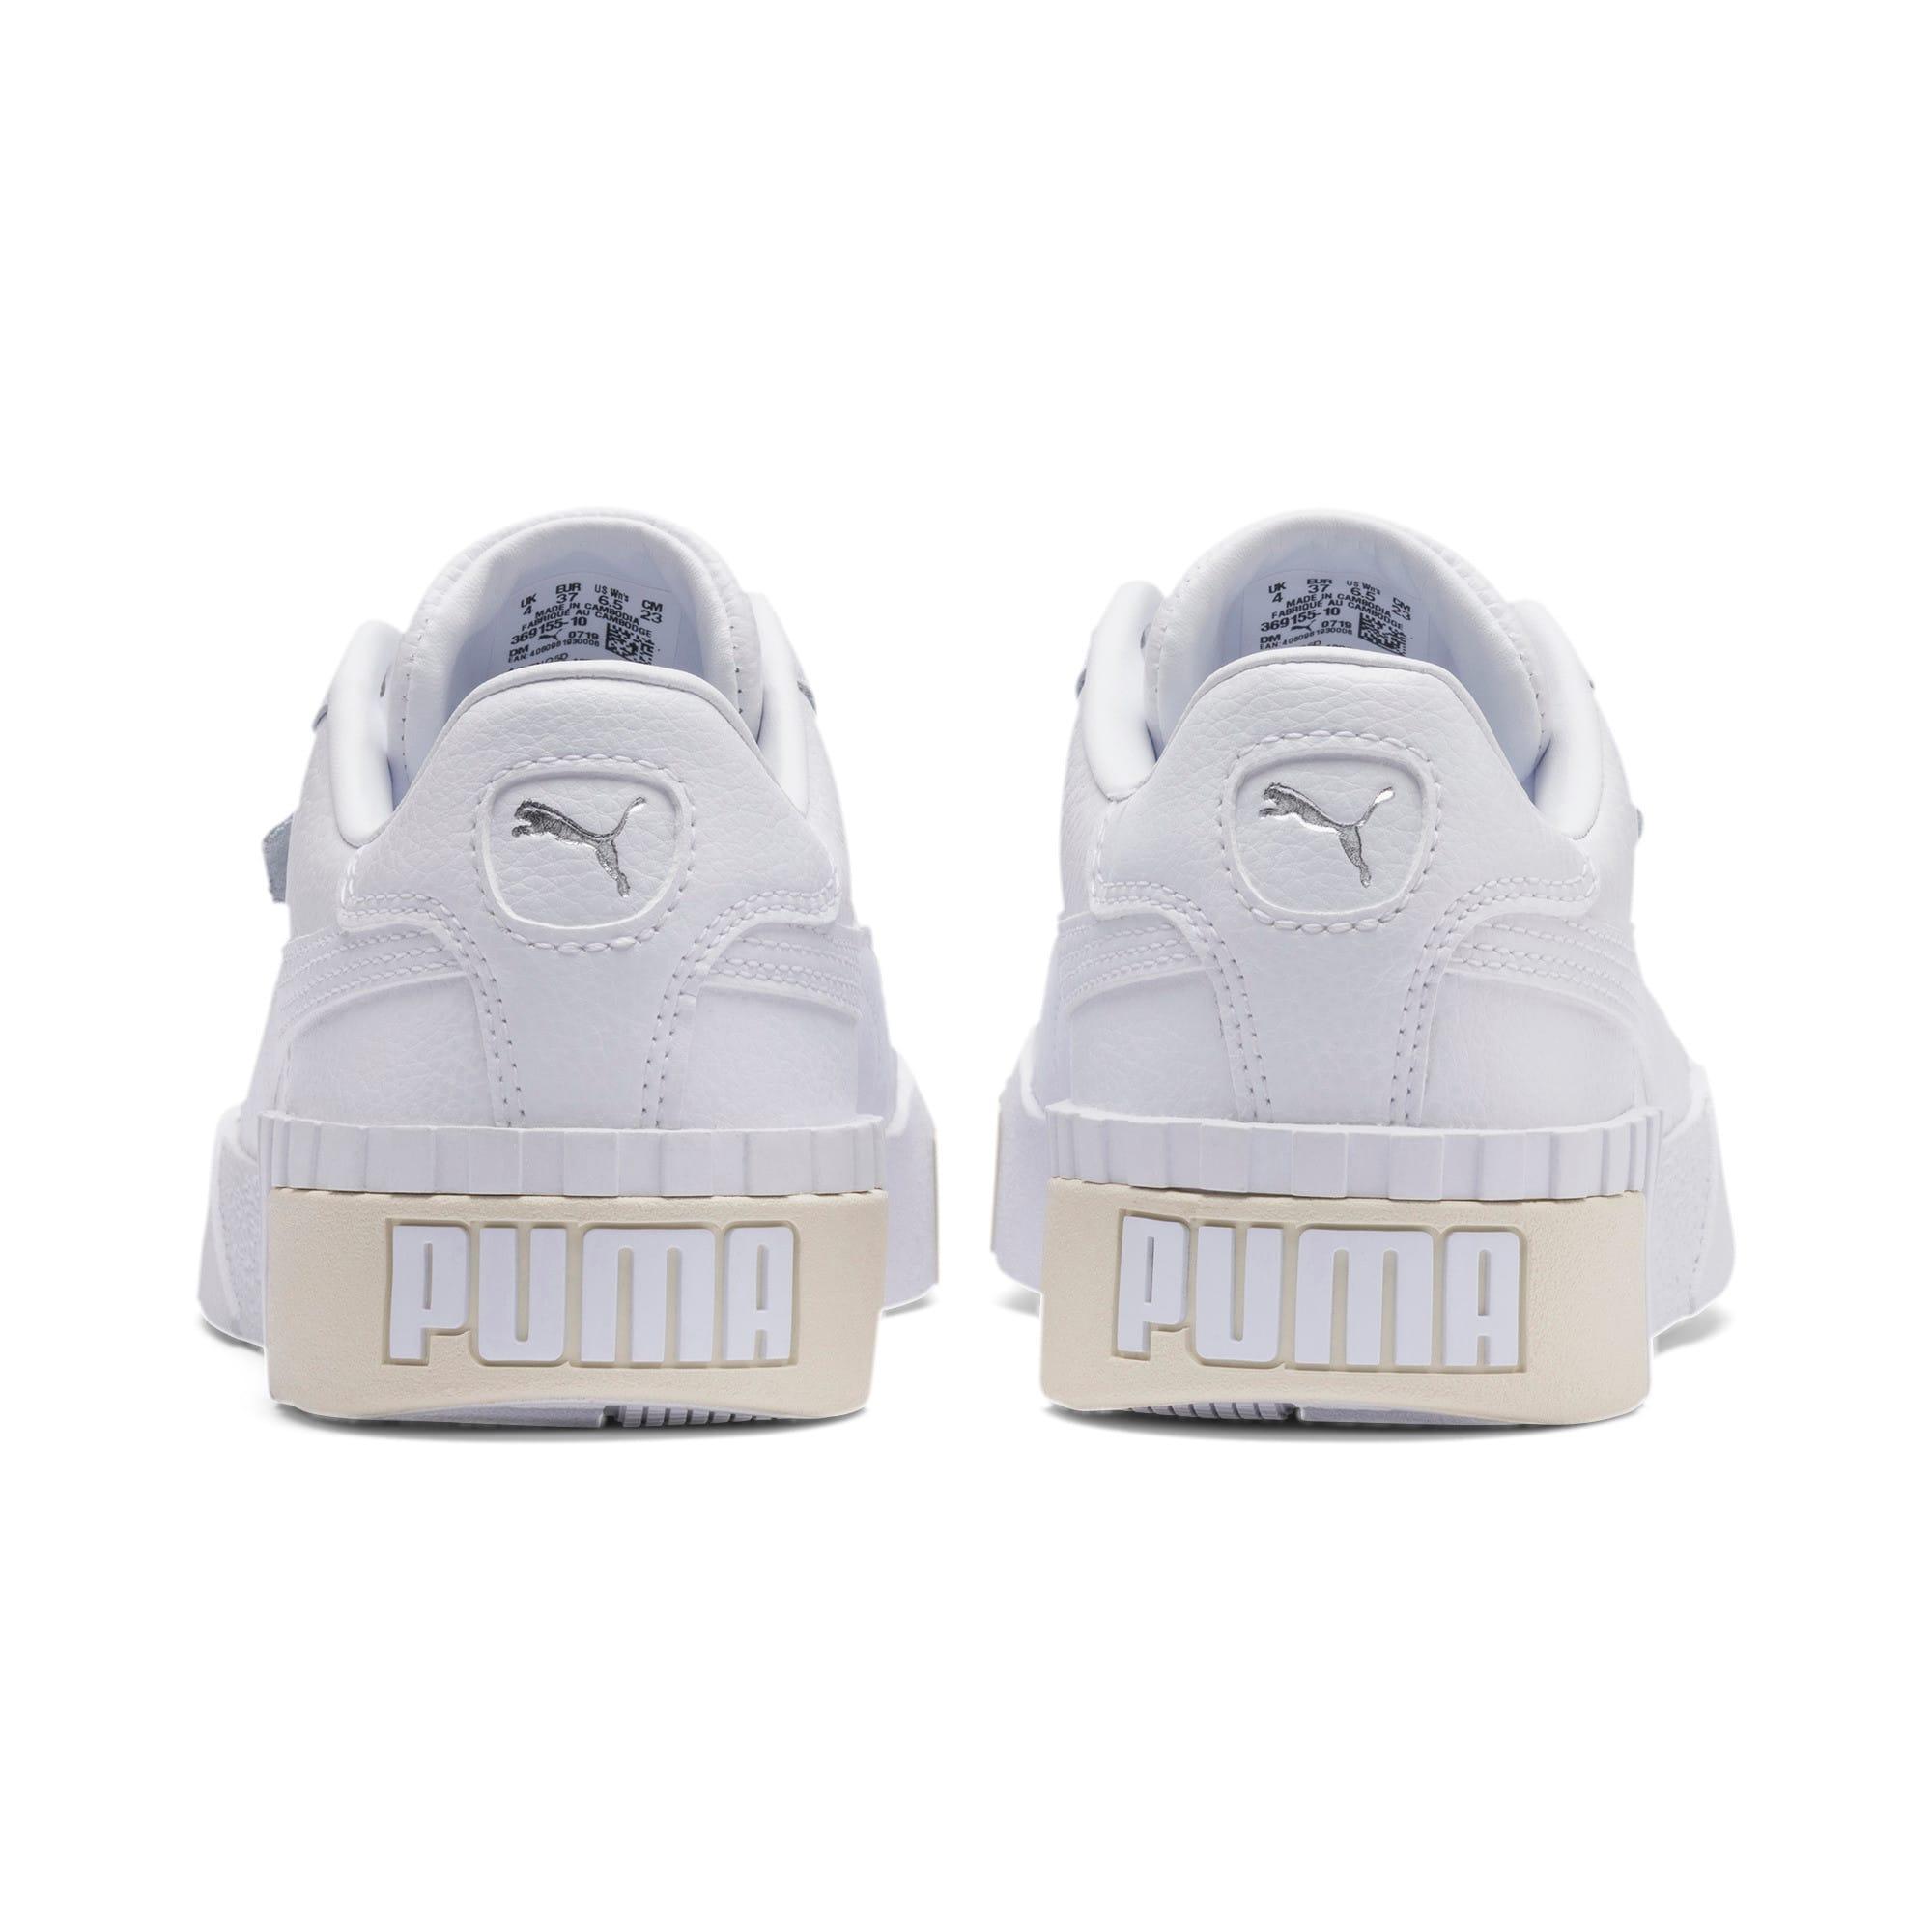 Imagen en miniatura 3 de Zapatillas de mujer Cali, Puma White-Whisper White, mediana